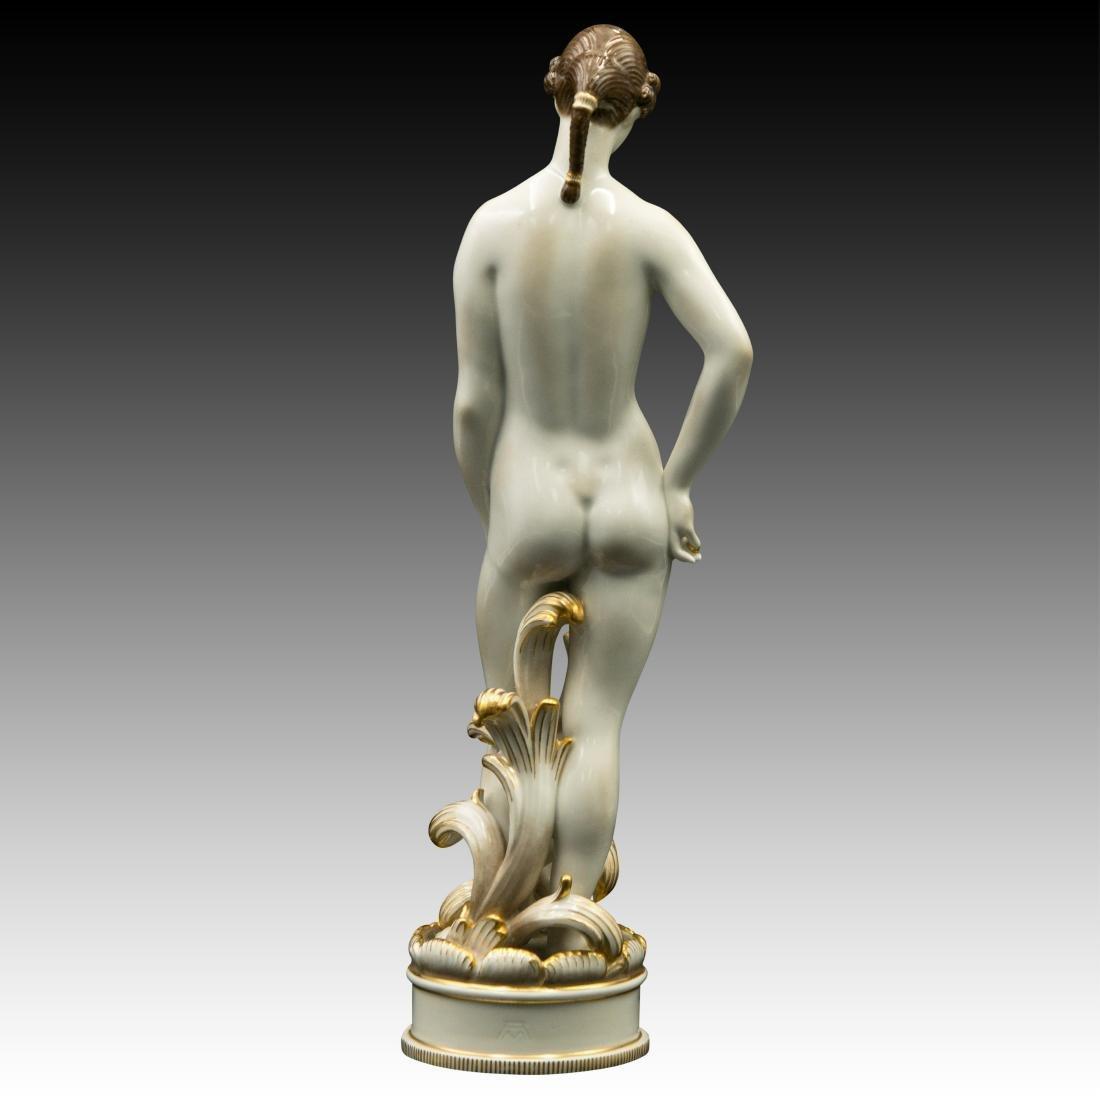 Royal Copenhagen Nude Female Brown Hair Figurine - 3